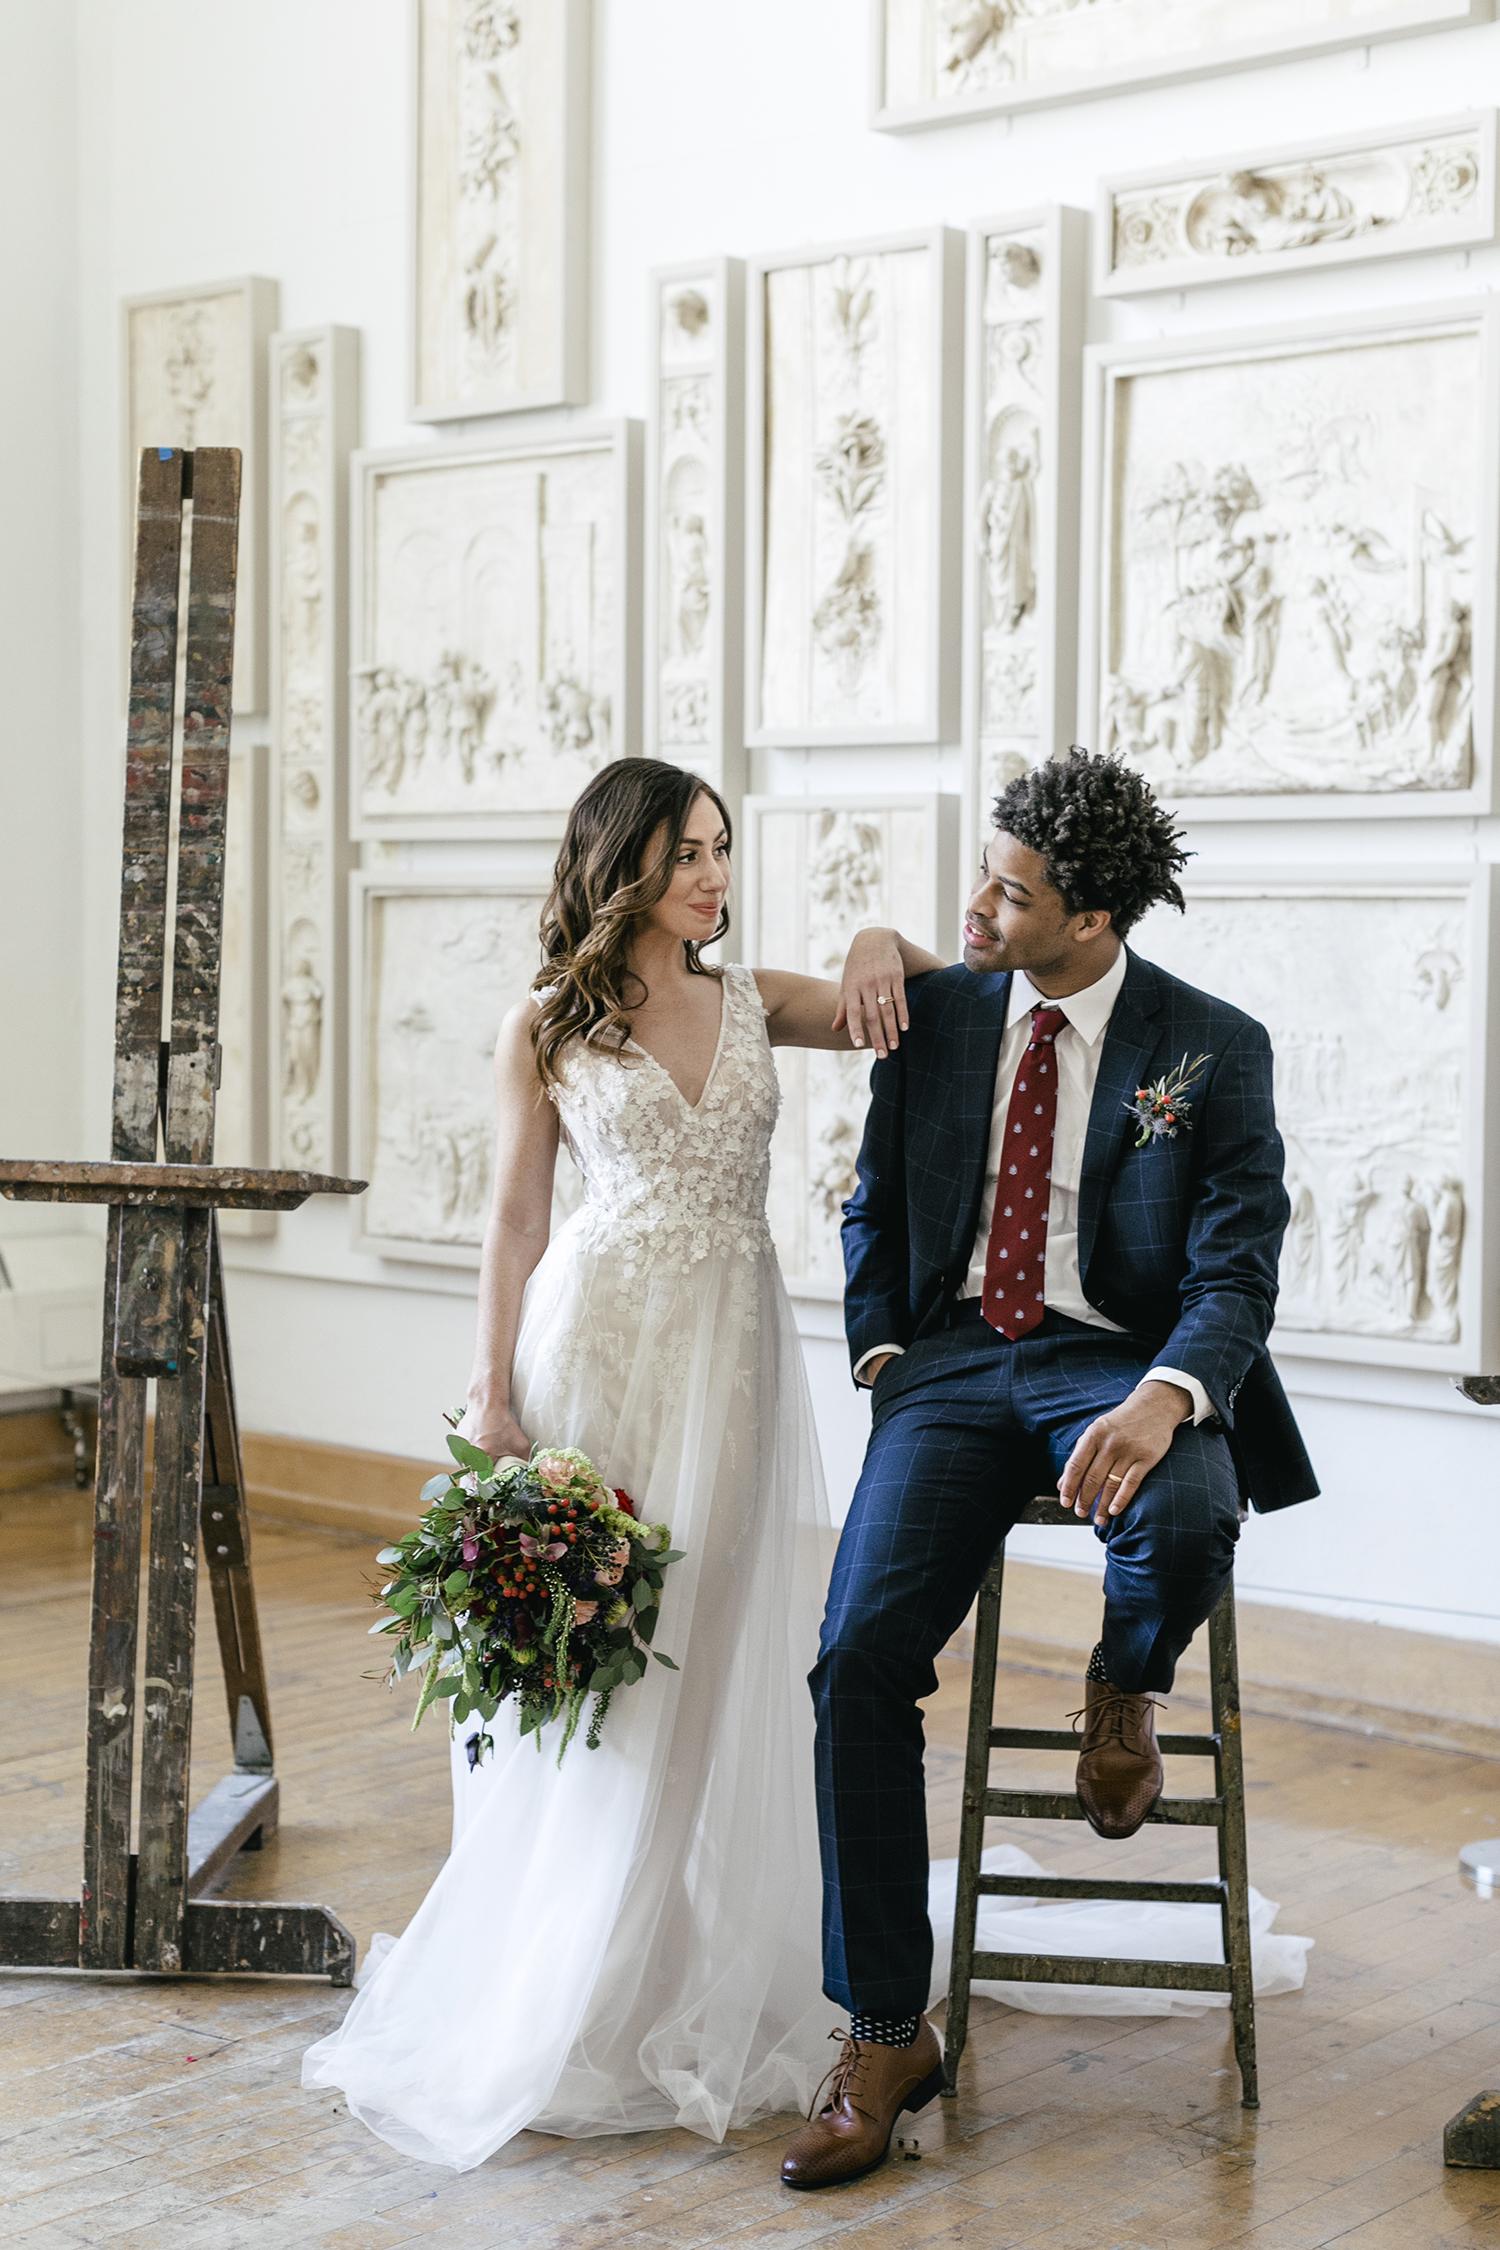 photography-wedding-weddings-natural-candid-pafa-pennsylvania academy-philadephia-philly-philadelphia wedding-mixed race-editorial-modern-fine-art-040.JPG